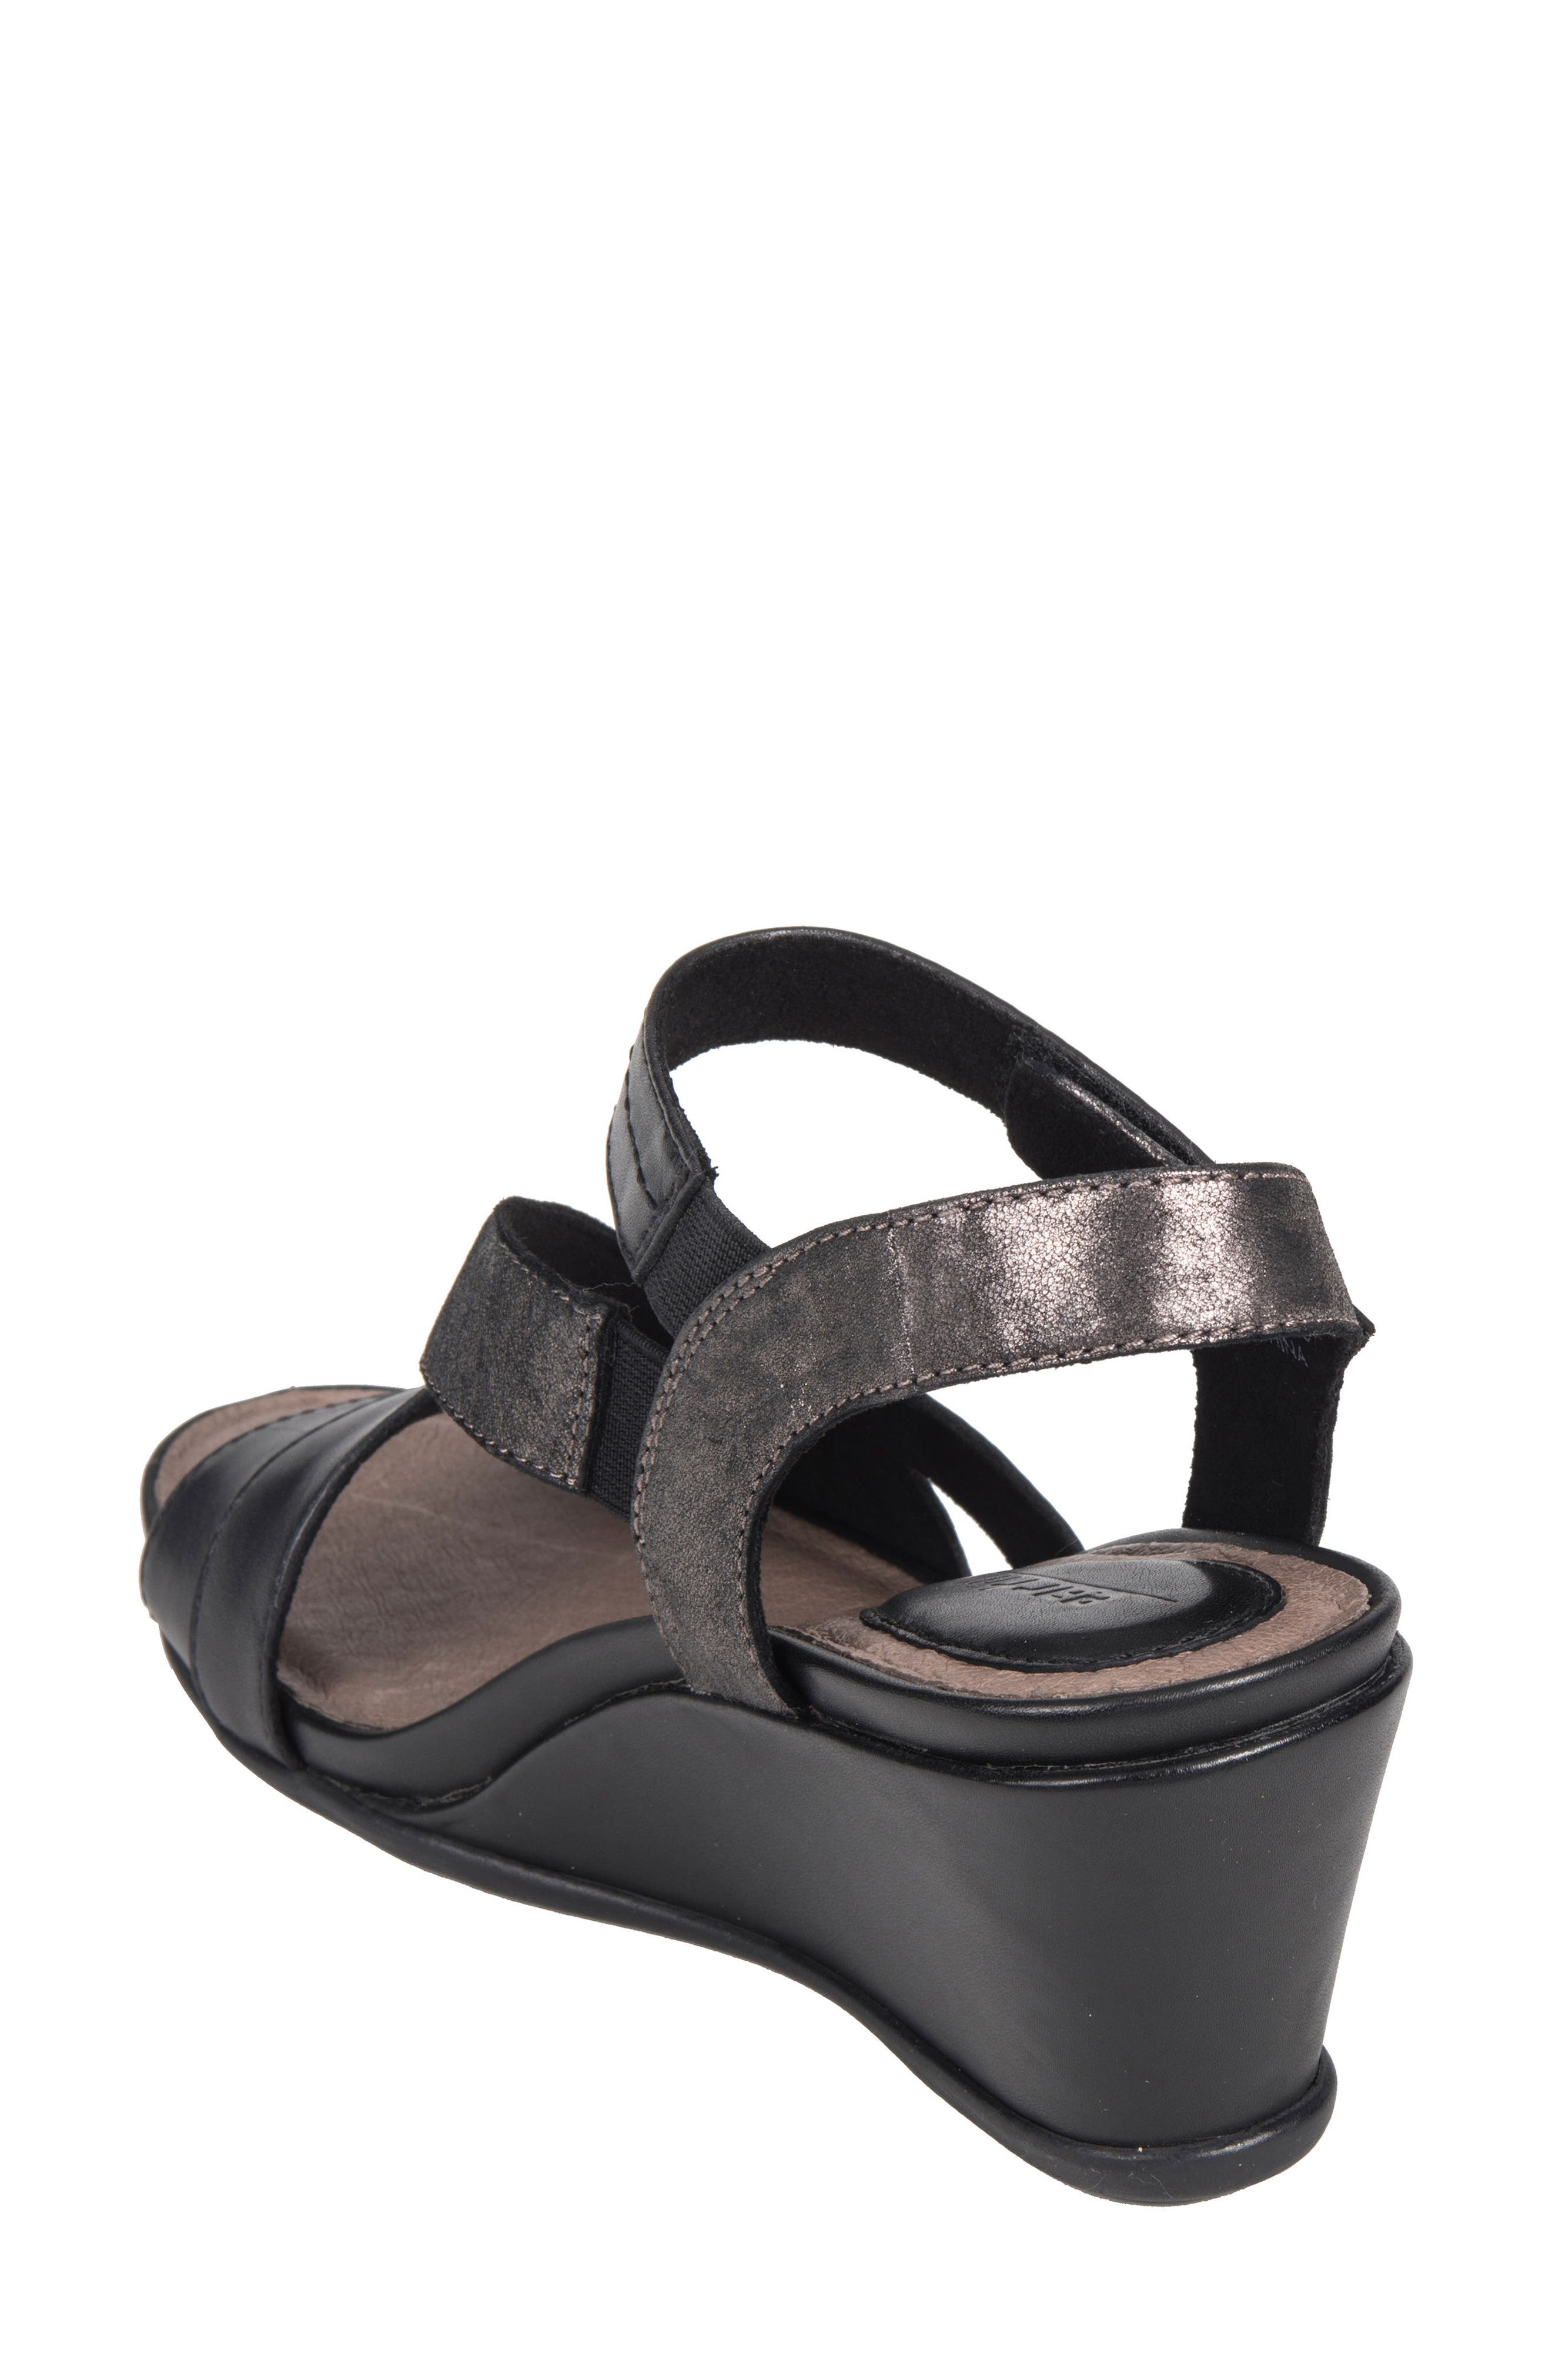 Thistle Wedge Sandal,                             Alternate thumbnail 21, color,